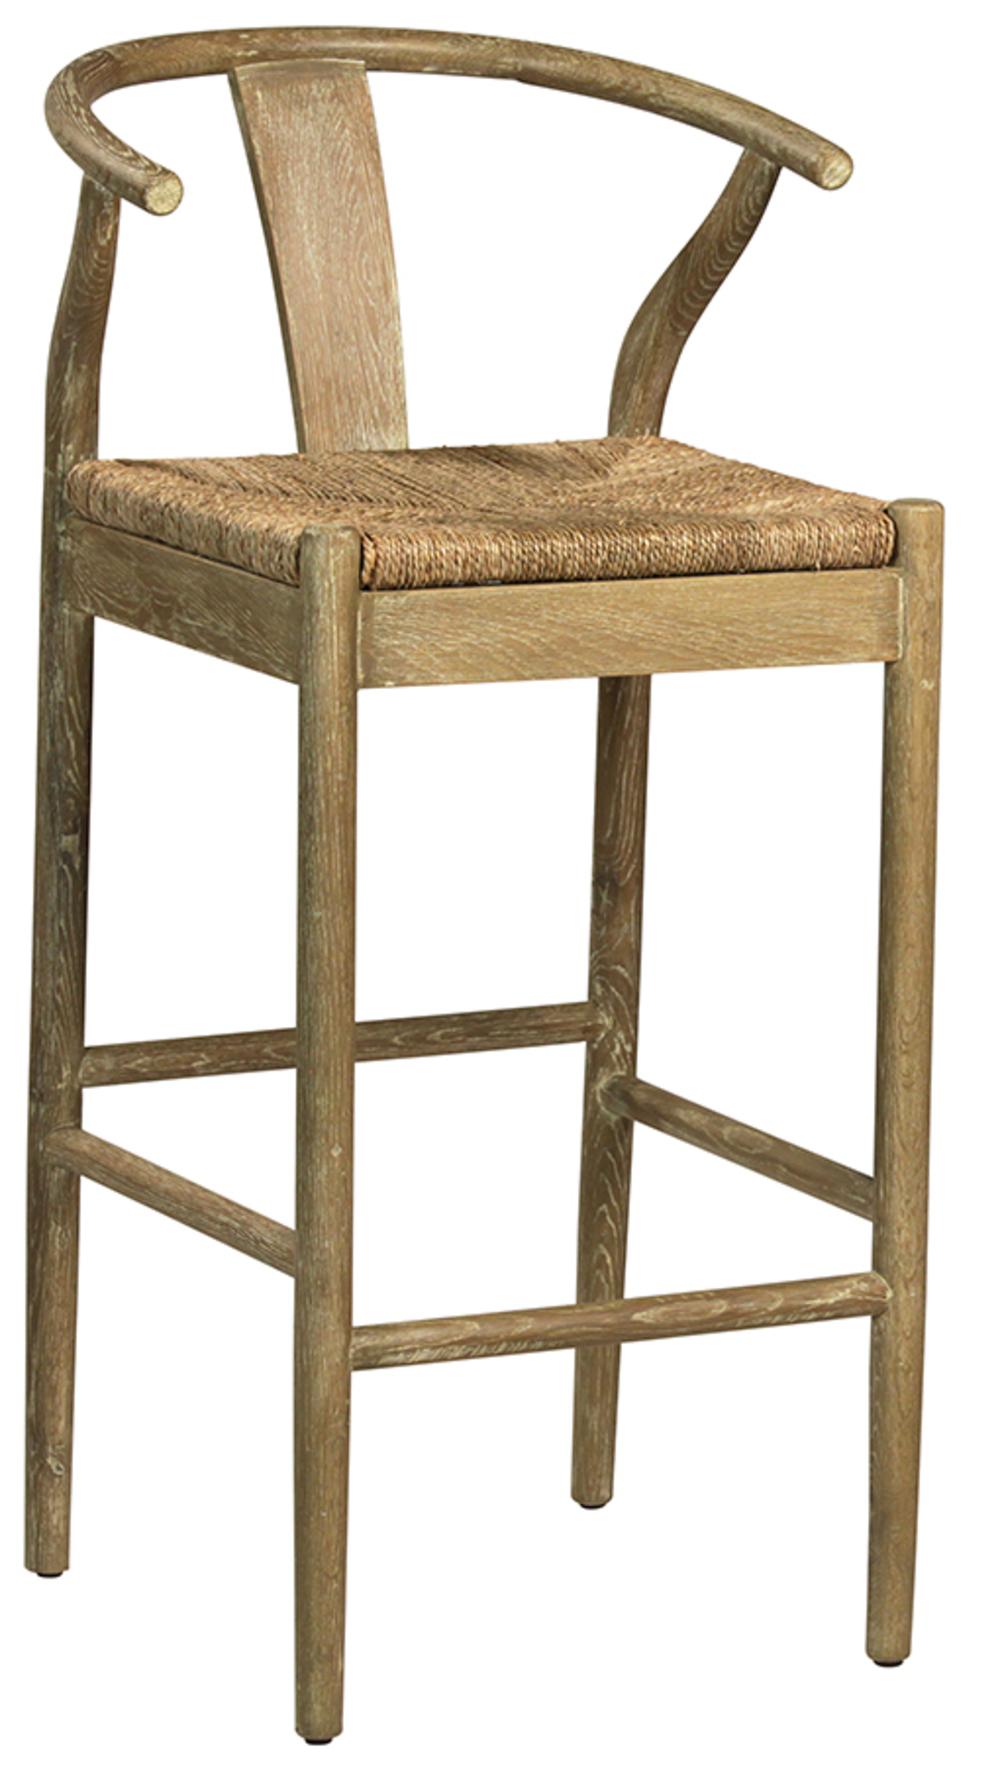 Dovetail Furniture - Moya Bar Stool